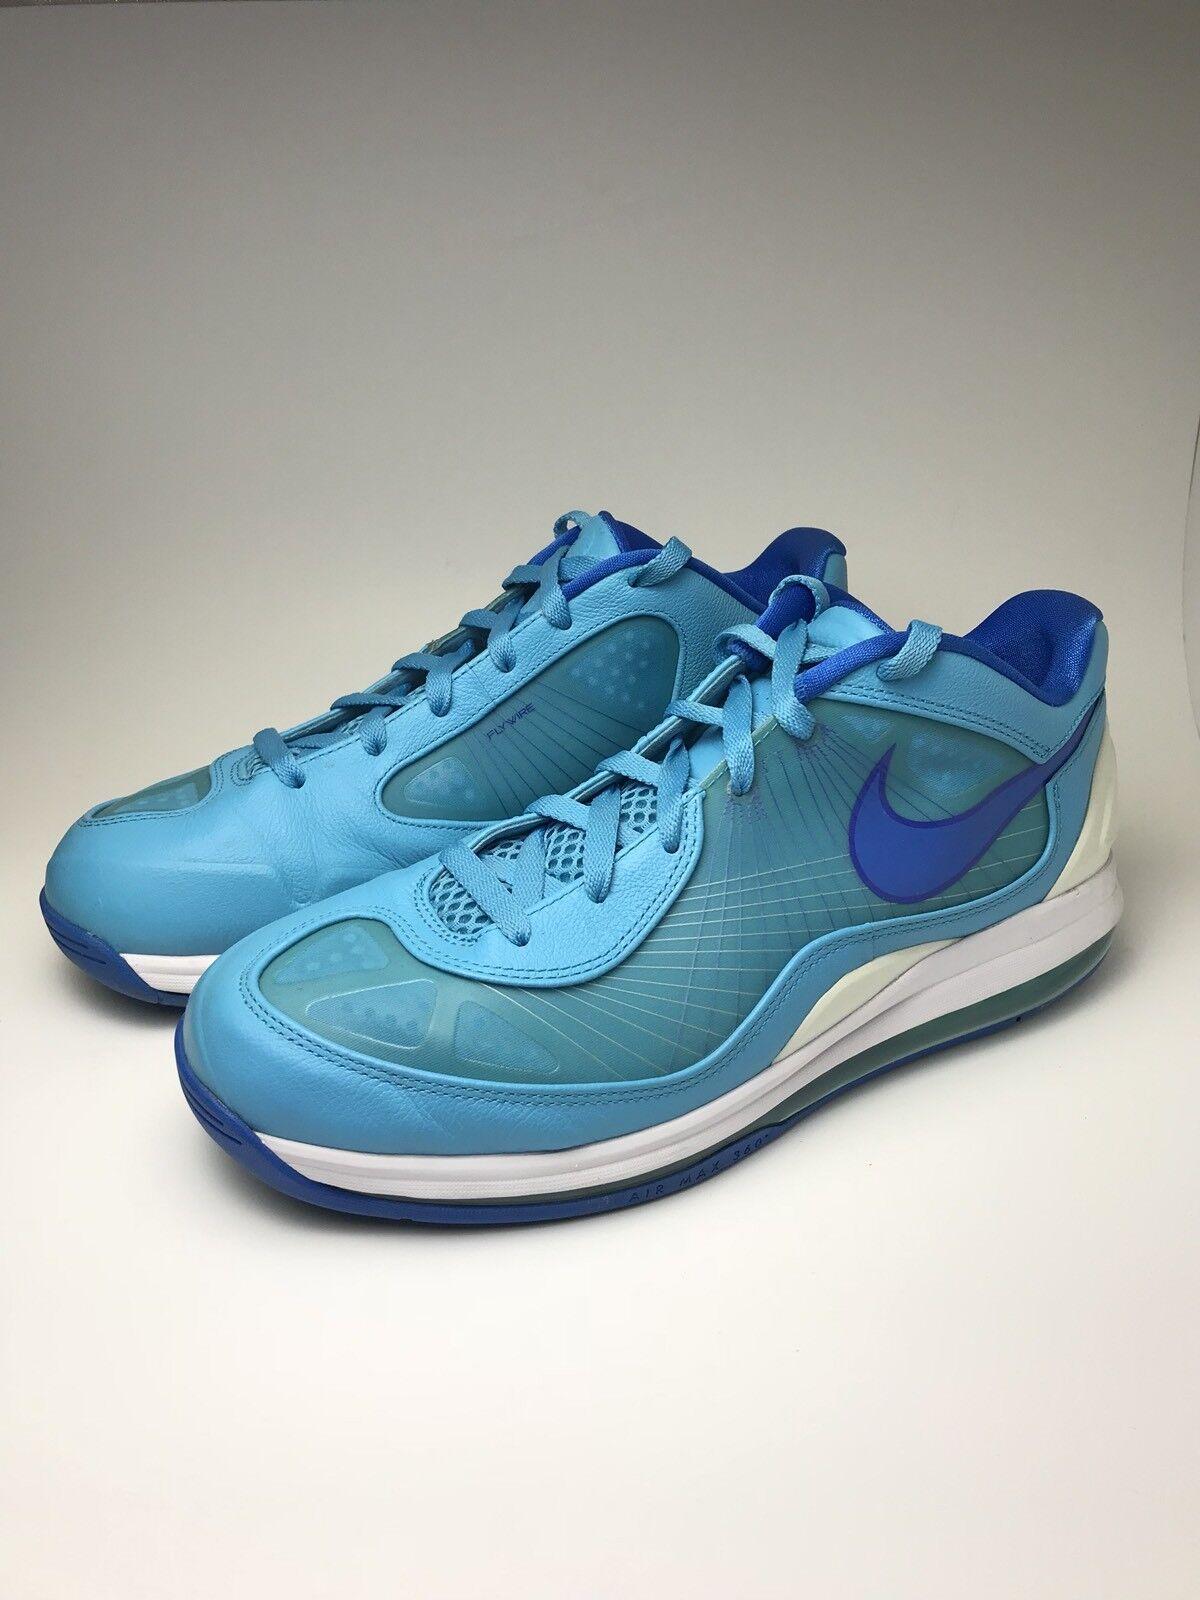 Nike Air Max 360  BB Low Chlorine Blue Size 11